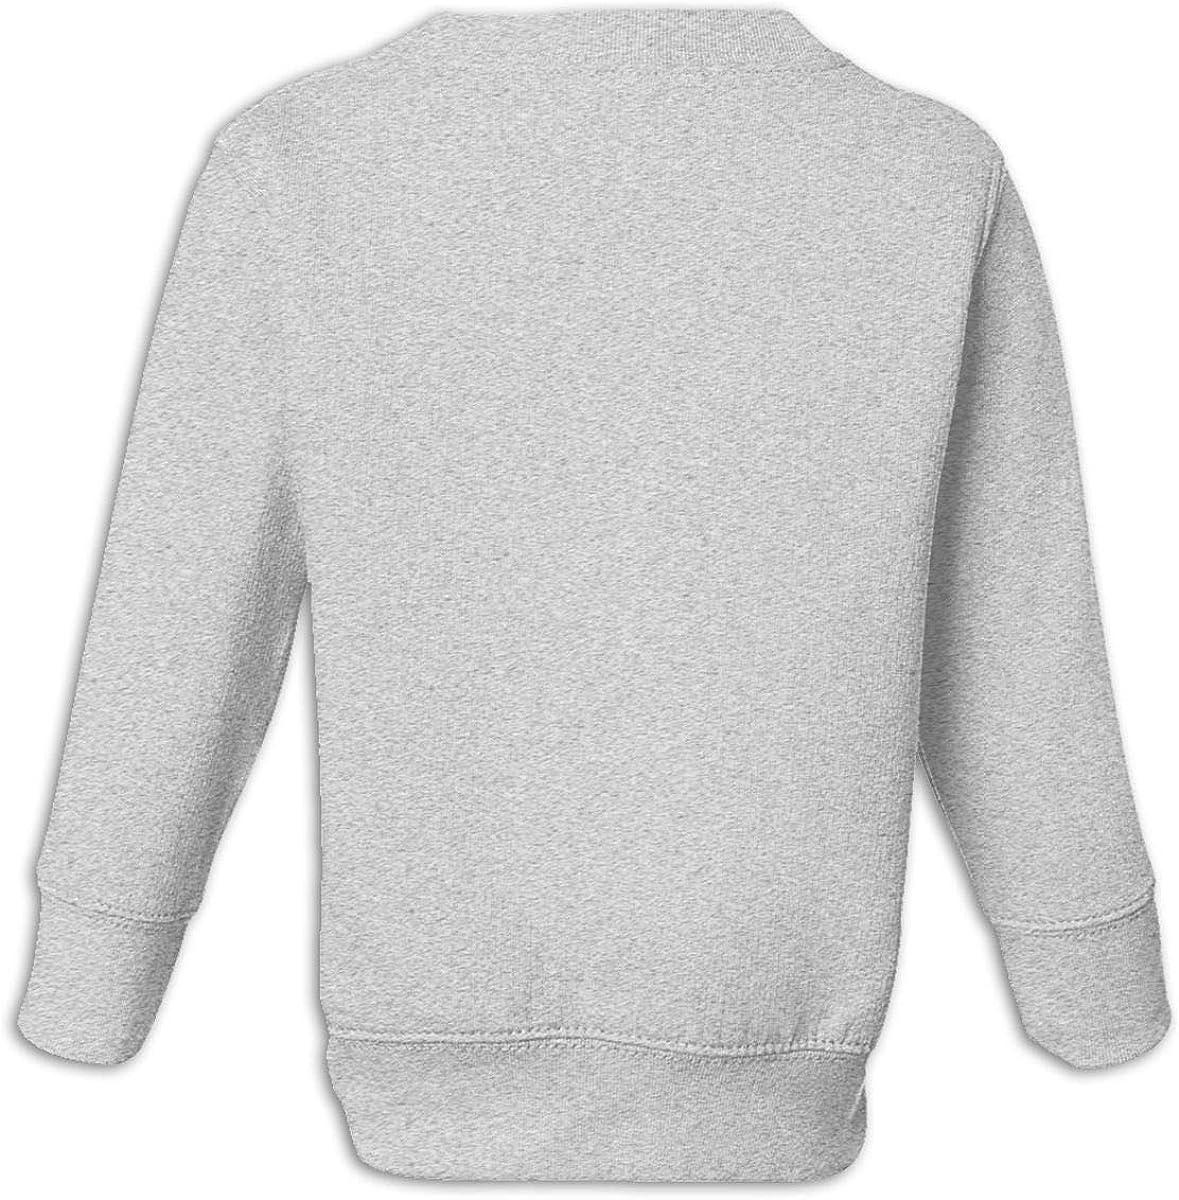 HsHdesign Juvenile Long Sleeves Skull Surrender Graphic Sweatshirts for Spring//Autumn//Winter 2-6T